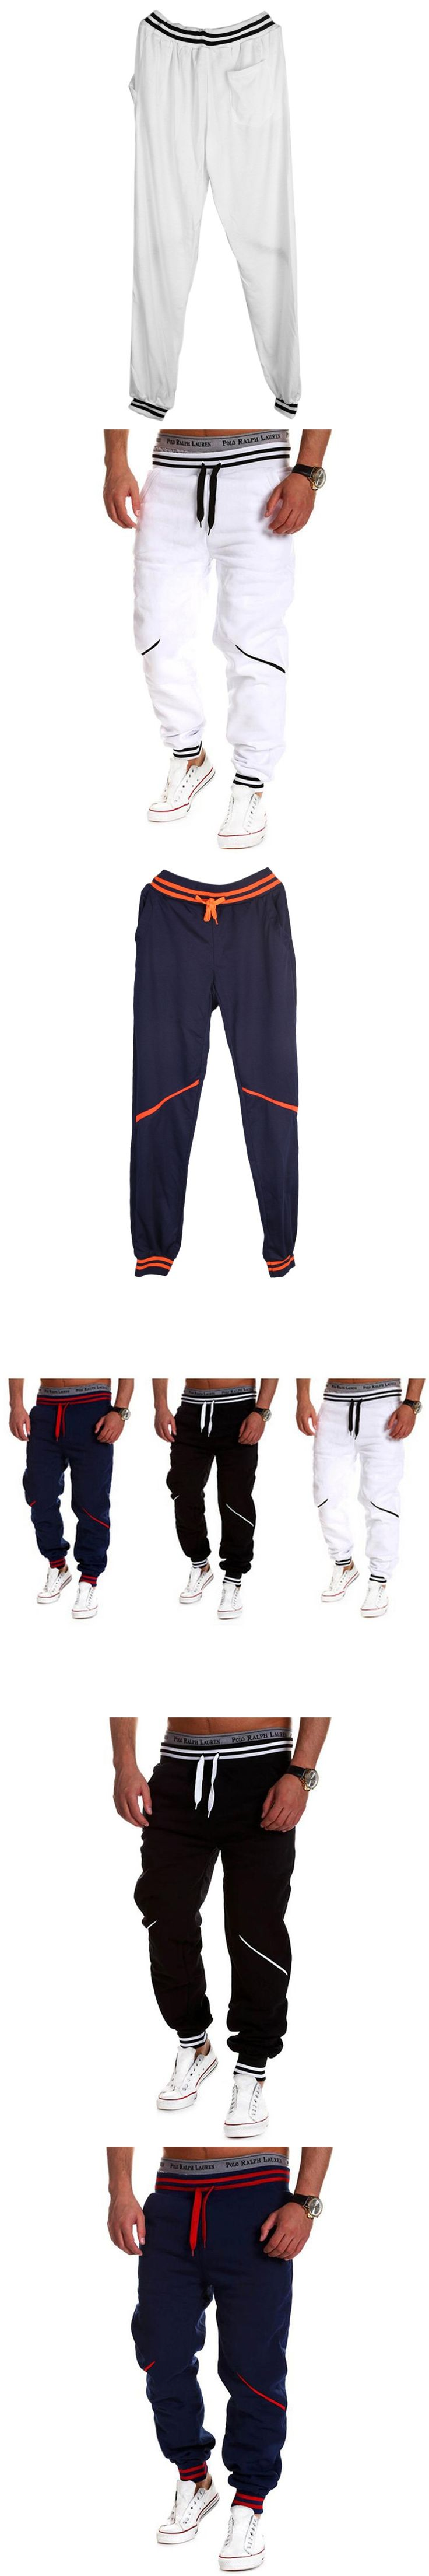 Brand Men Pants Hip Hop Harem Mens Joggers 2017 Brand Male Trousers Men Pants Casual Pants Sweatpants Jogger Black White Blue